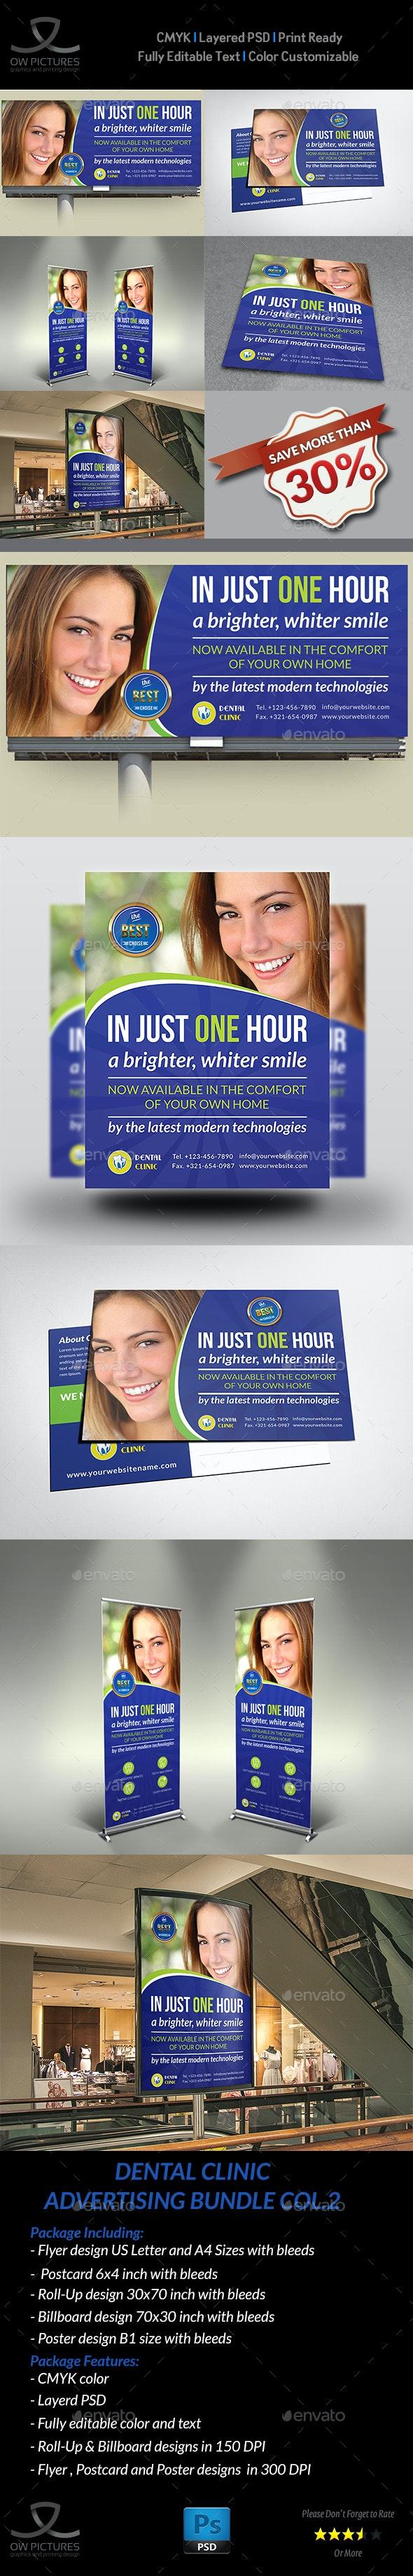 Dental Clinic Advertising Bundle Vol.2 - Signage Print Templates